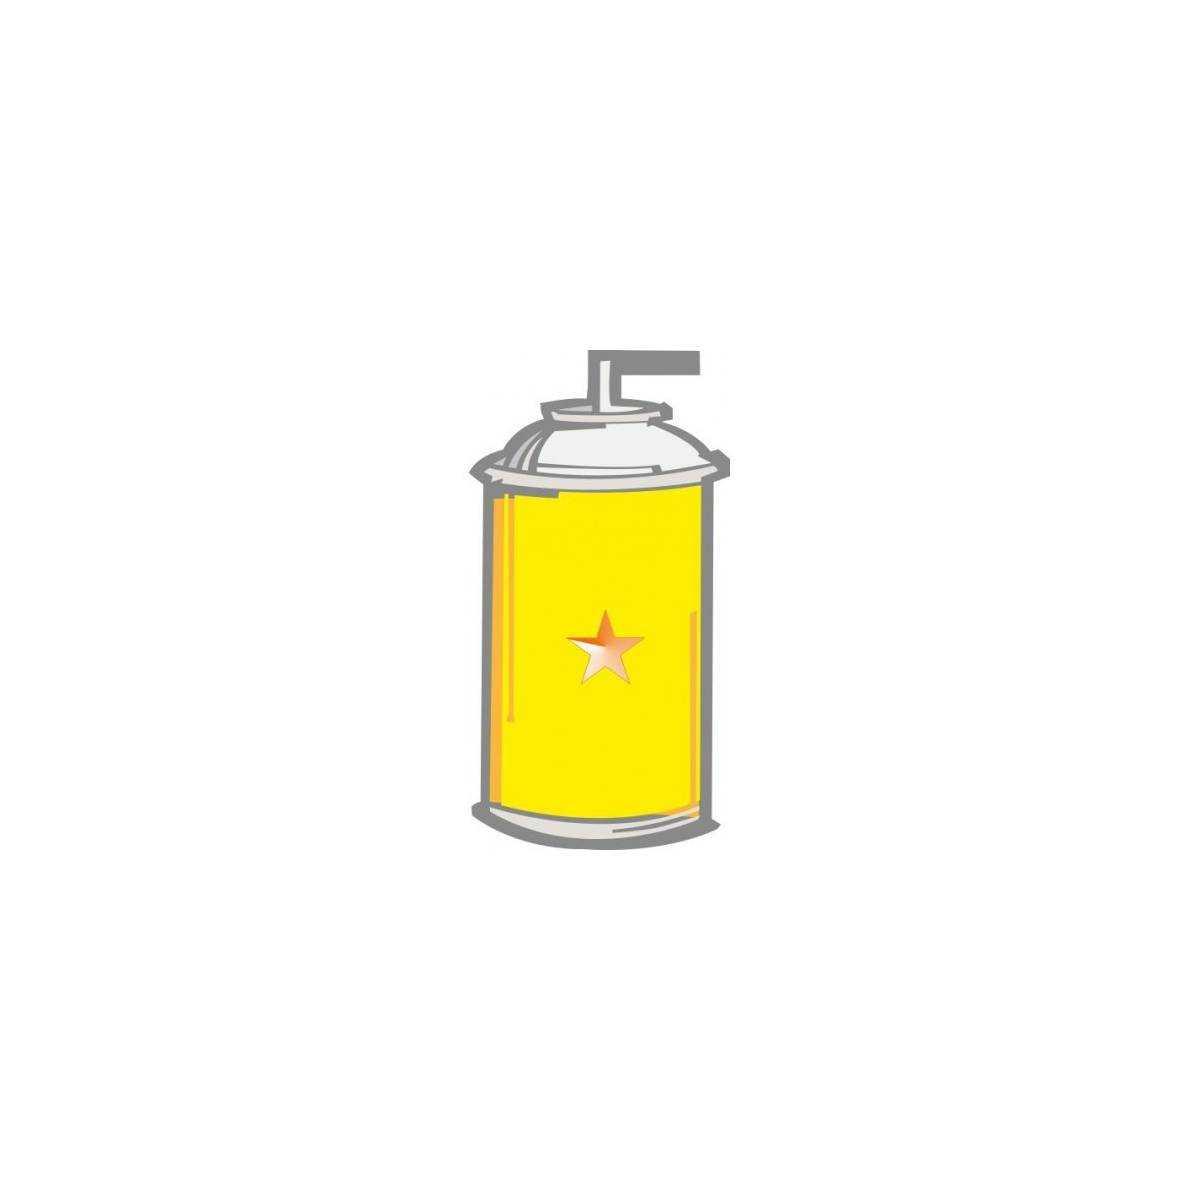 Аэрозольный баллончик 250мл, Греция (KIWI) 12-04-0037 Атма